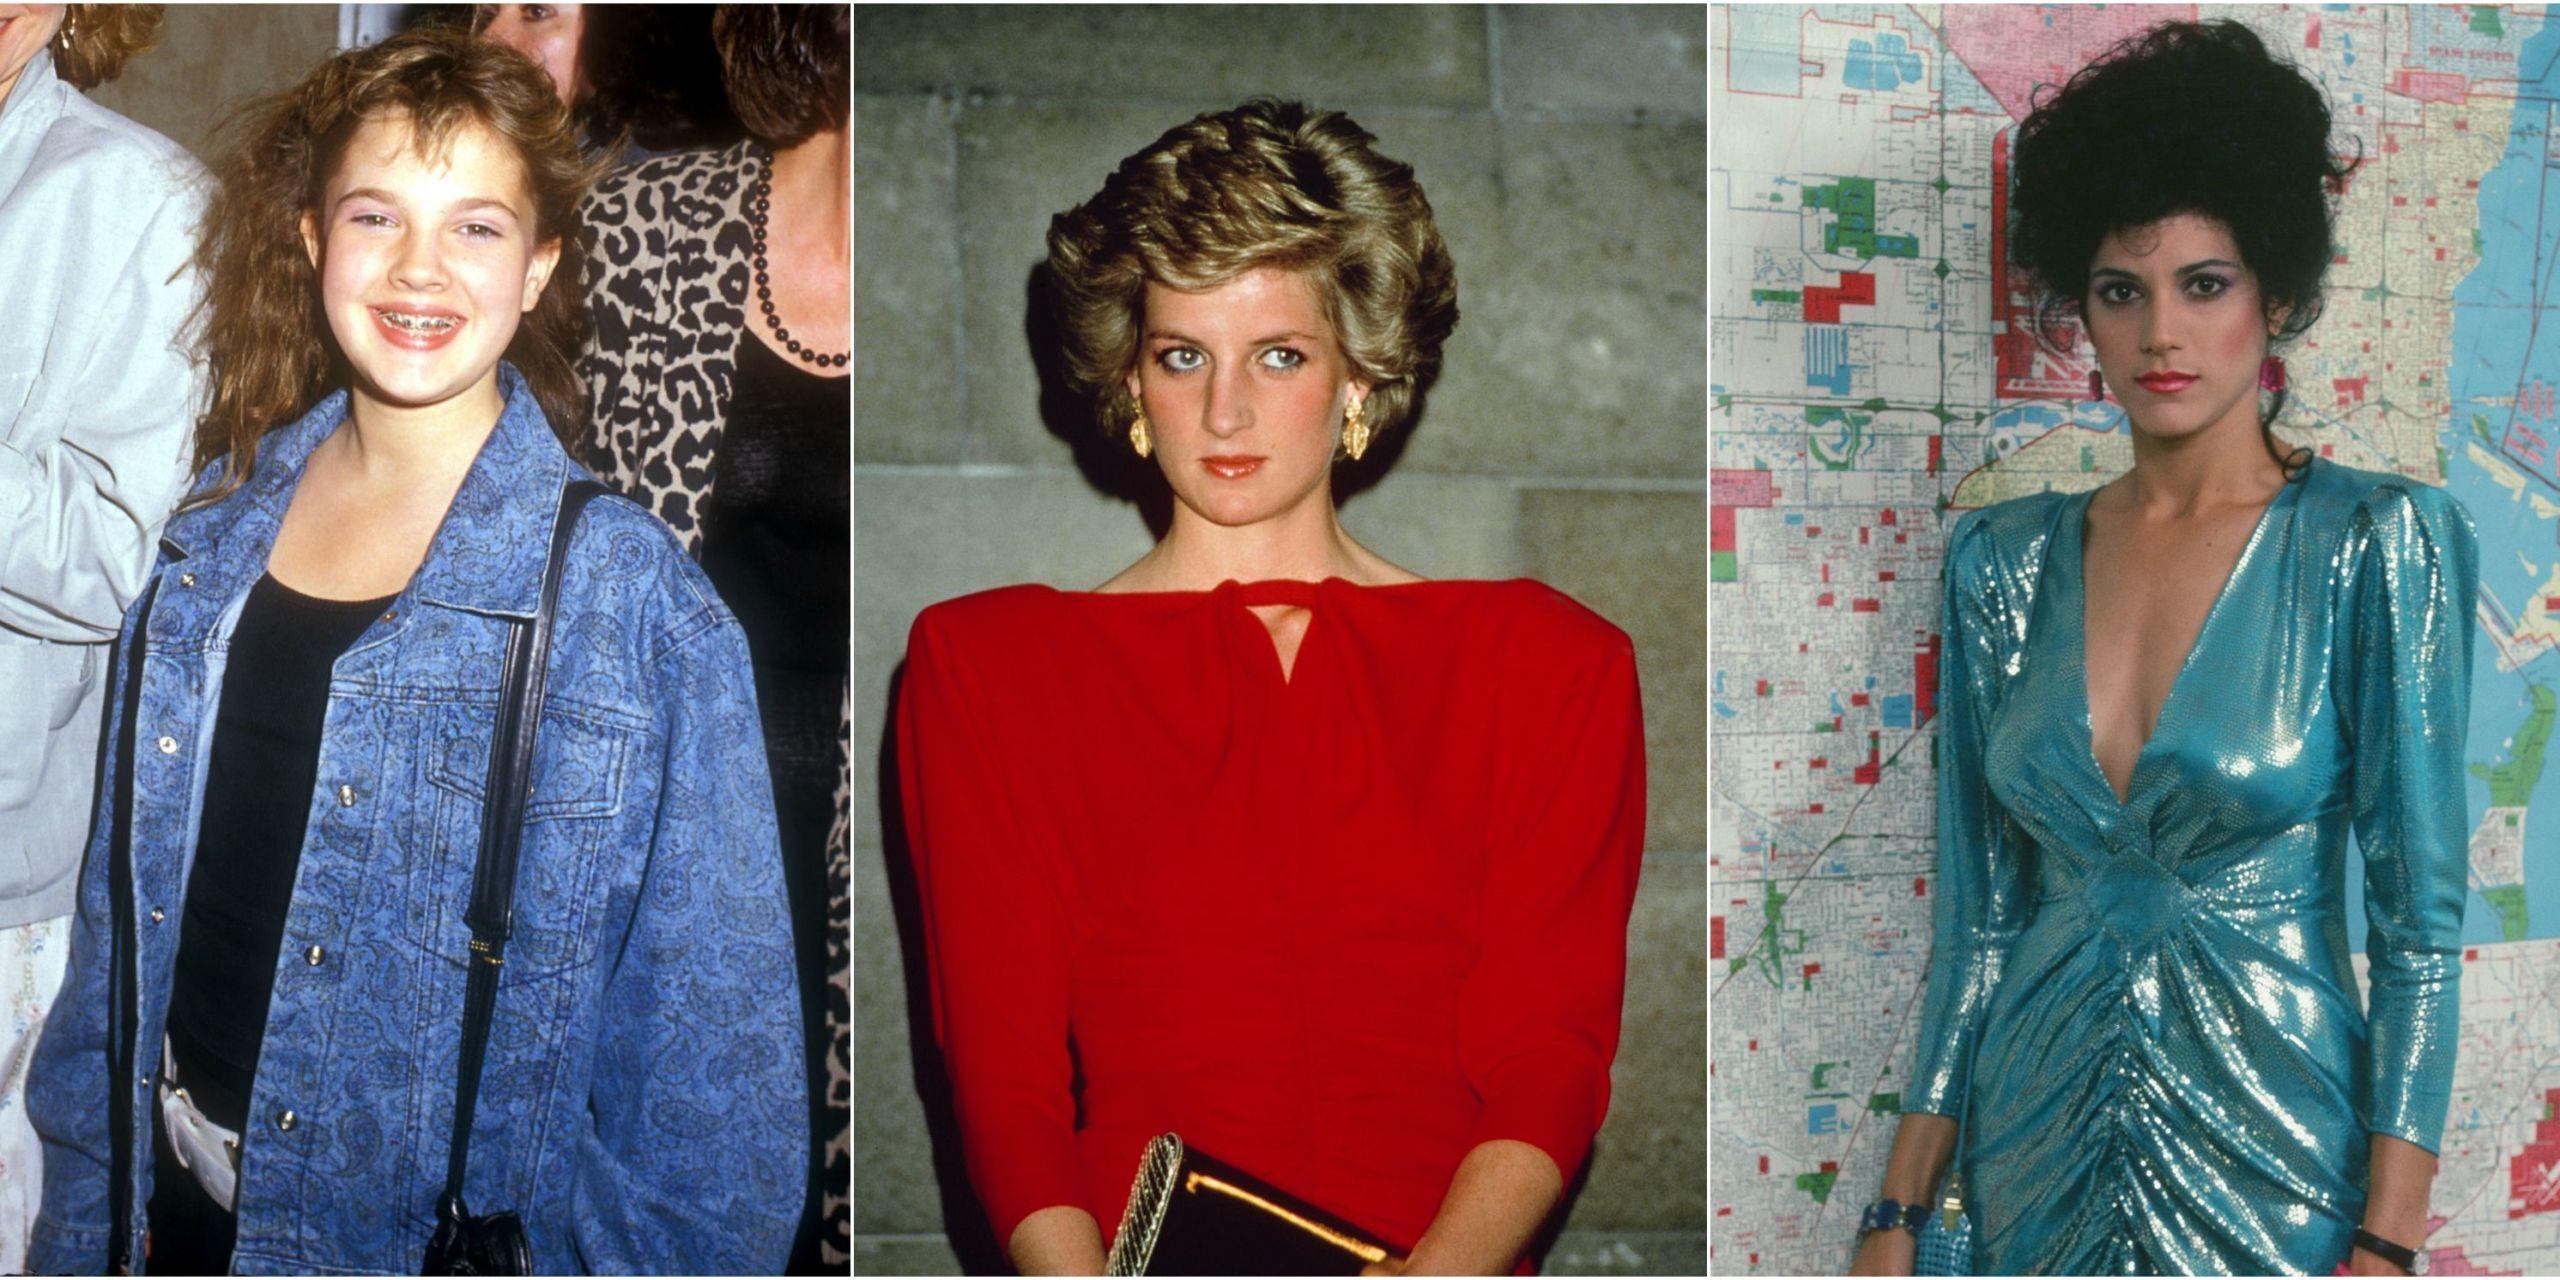 Fashion 80-ies coming back